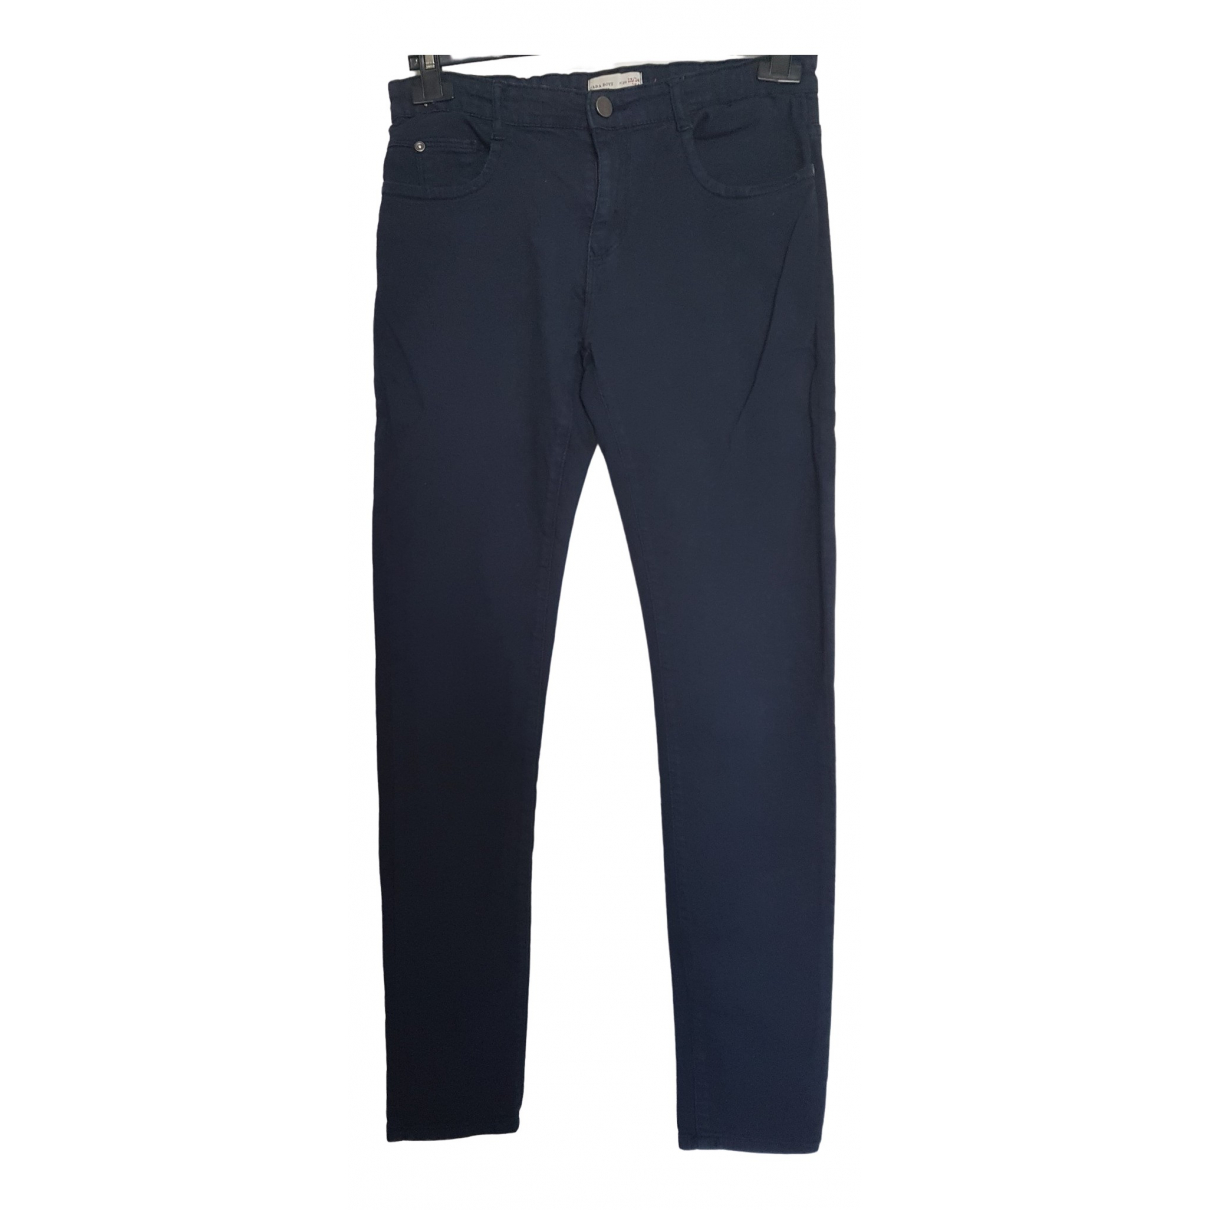 Pantalones en Algodon Azul Zara